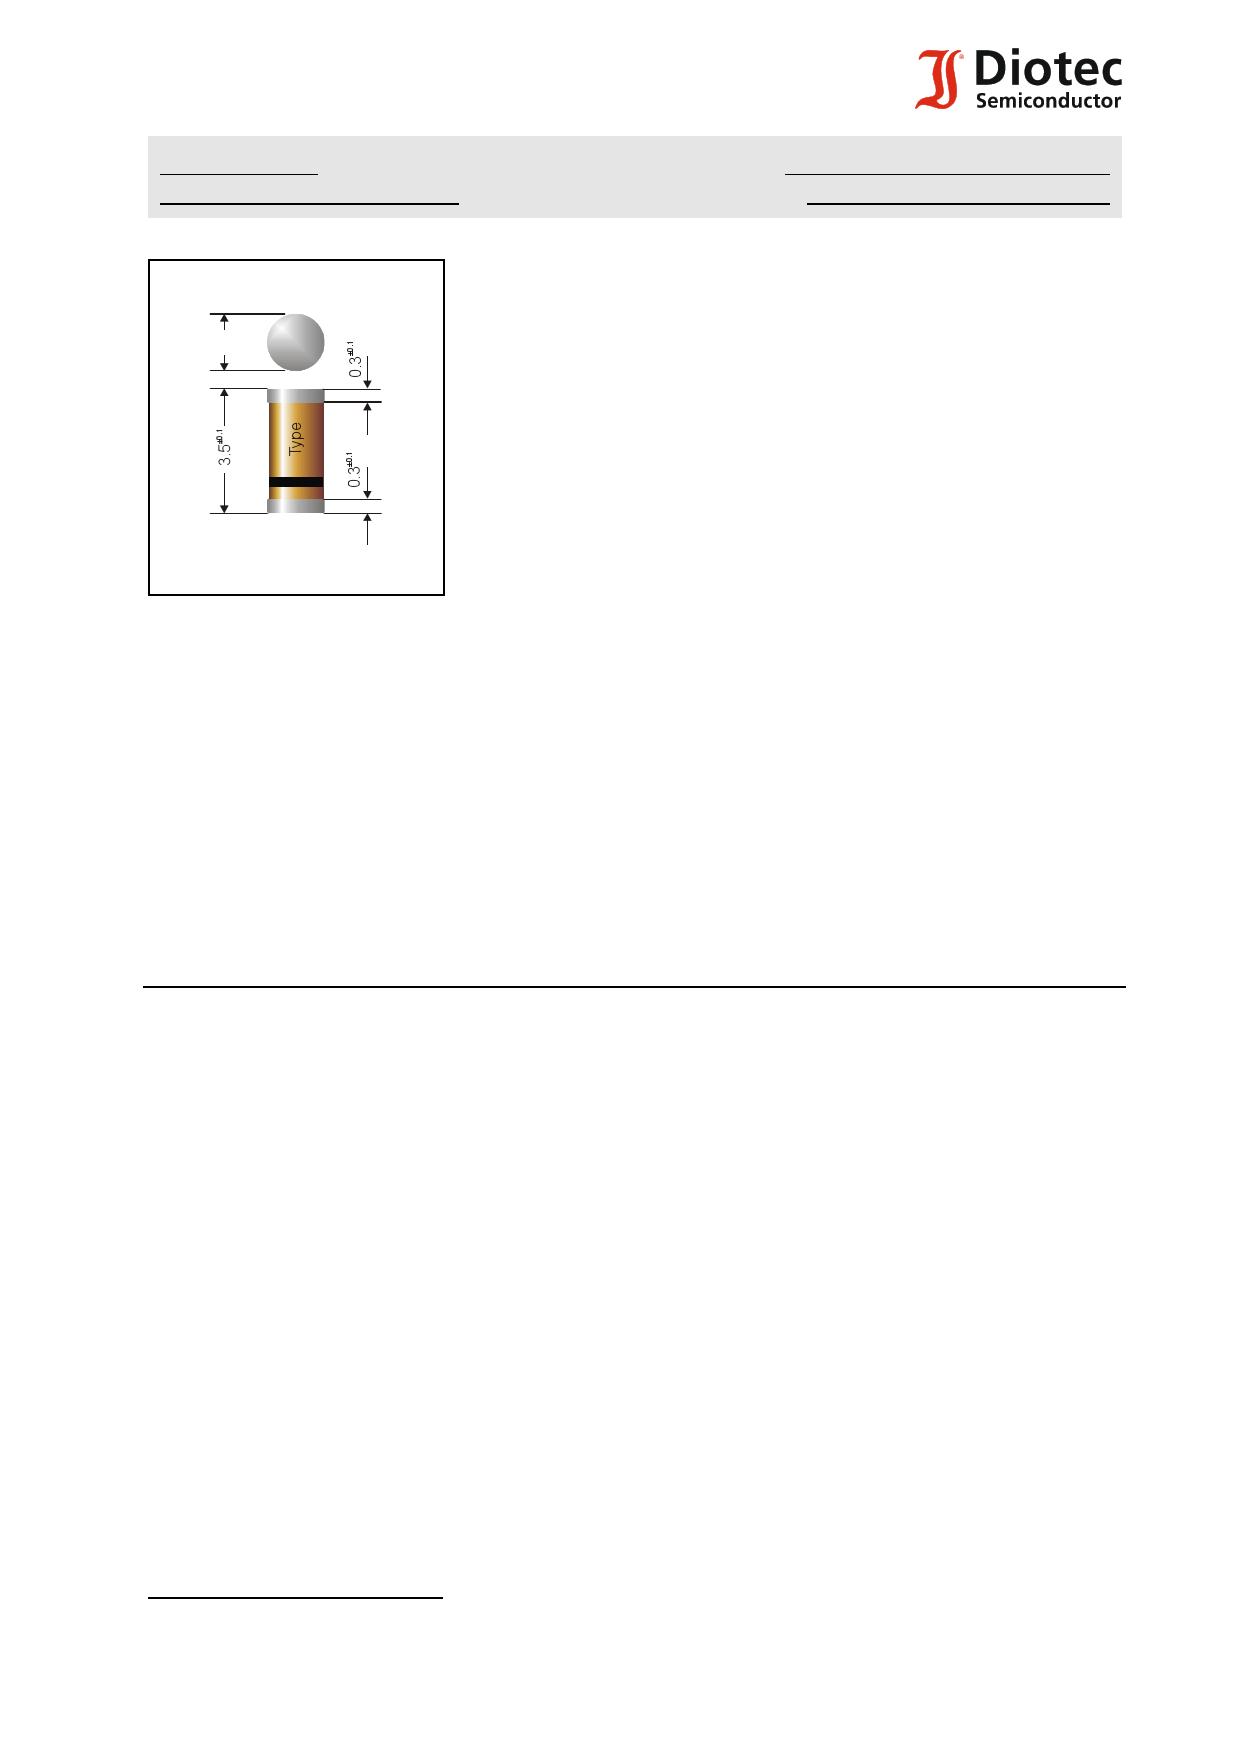 ZMM5.6 datasheet